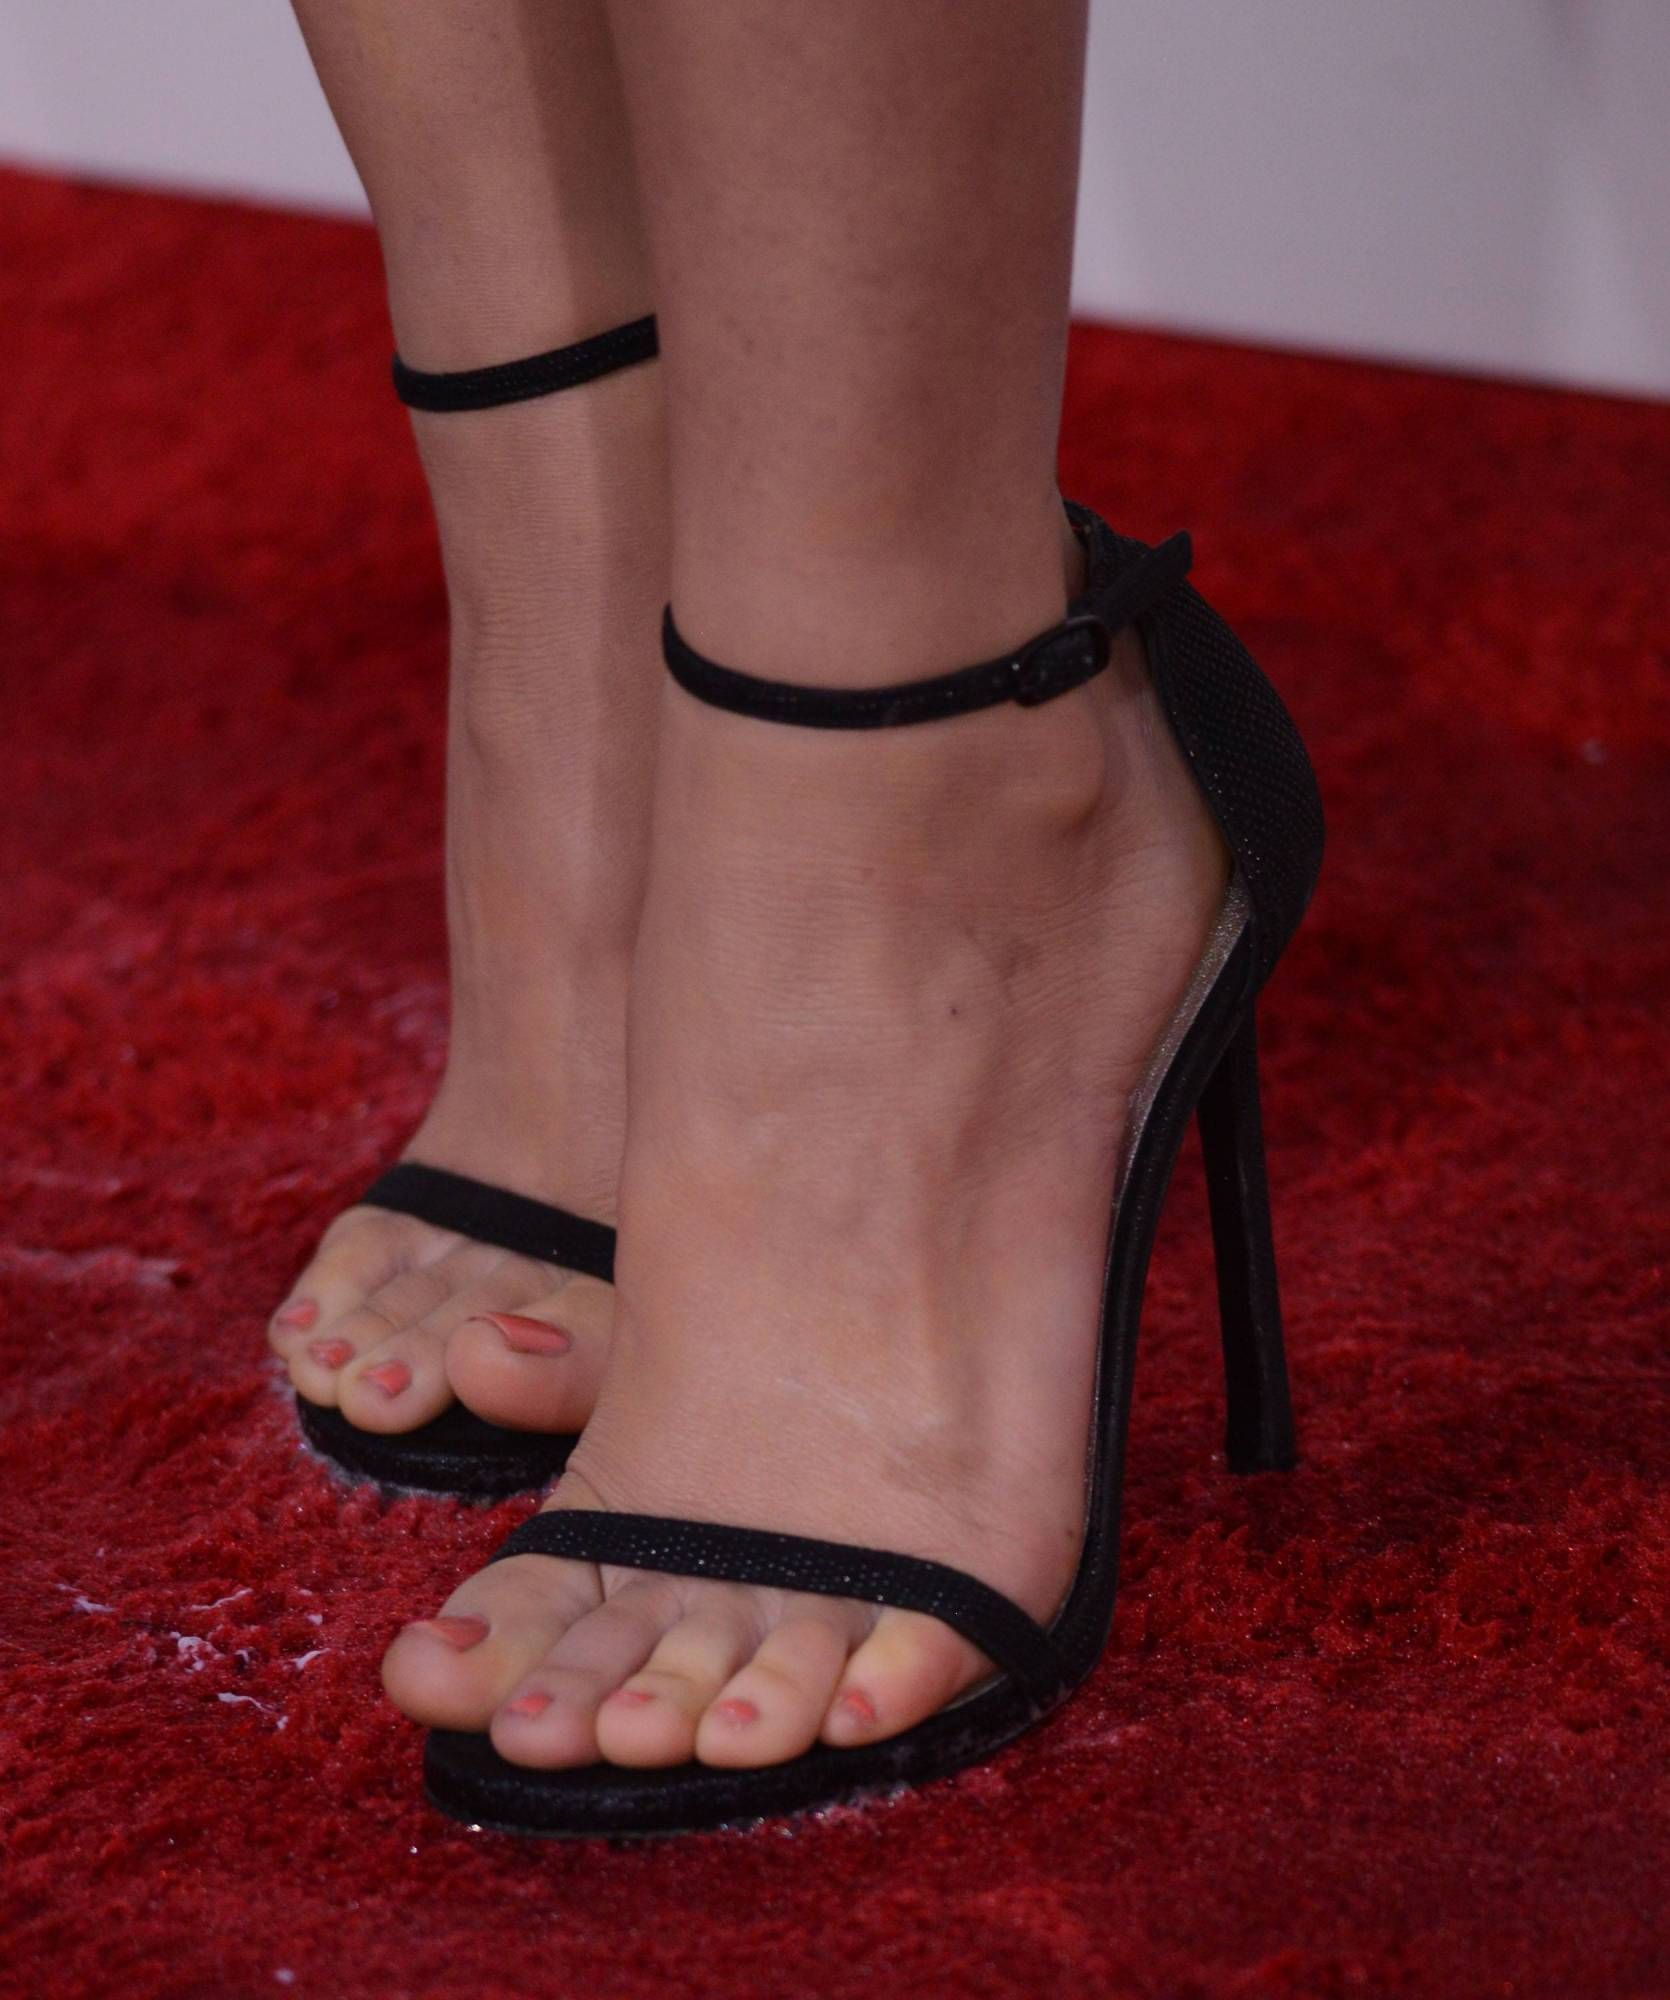 Olivia Munn Wikitoes Pies Hermosos De Mujer Tacones Sandalias Tacon